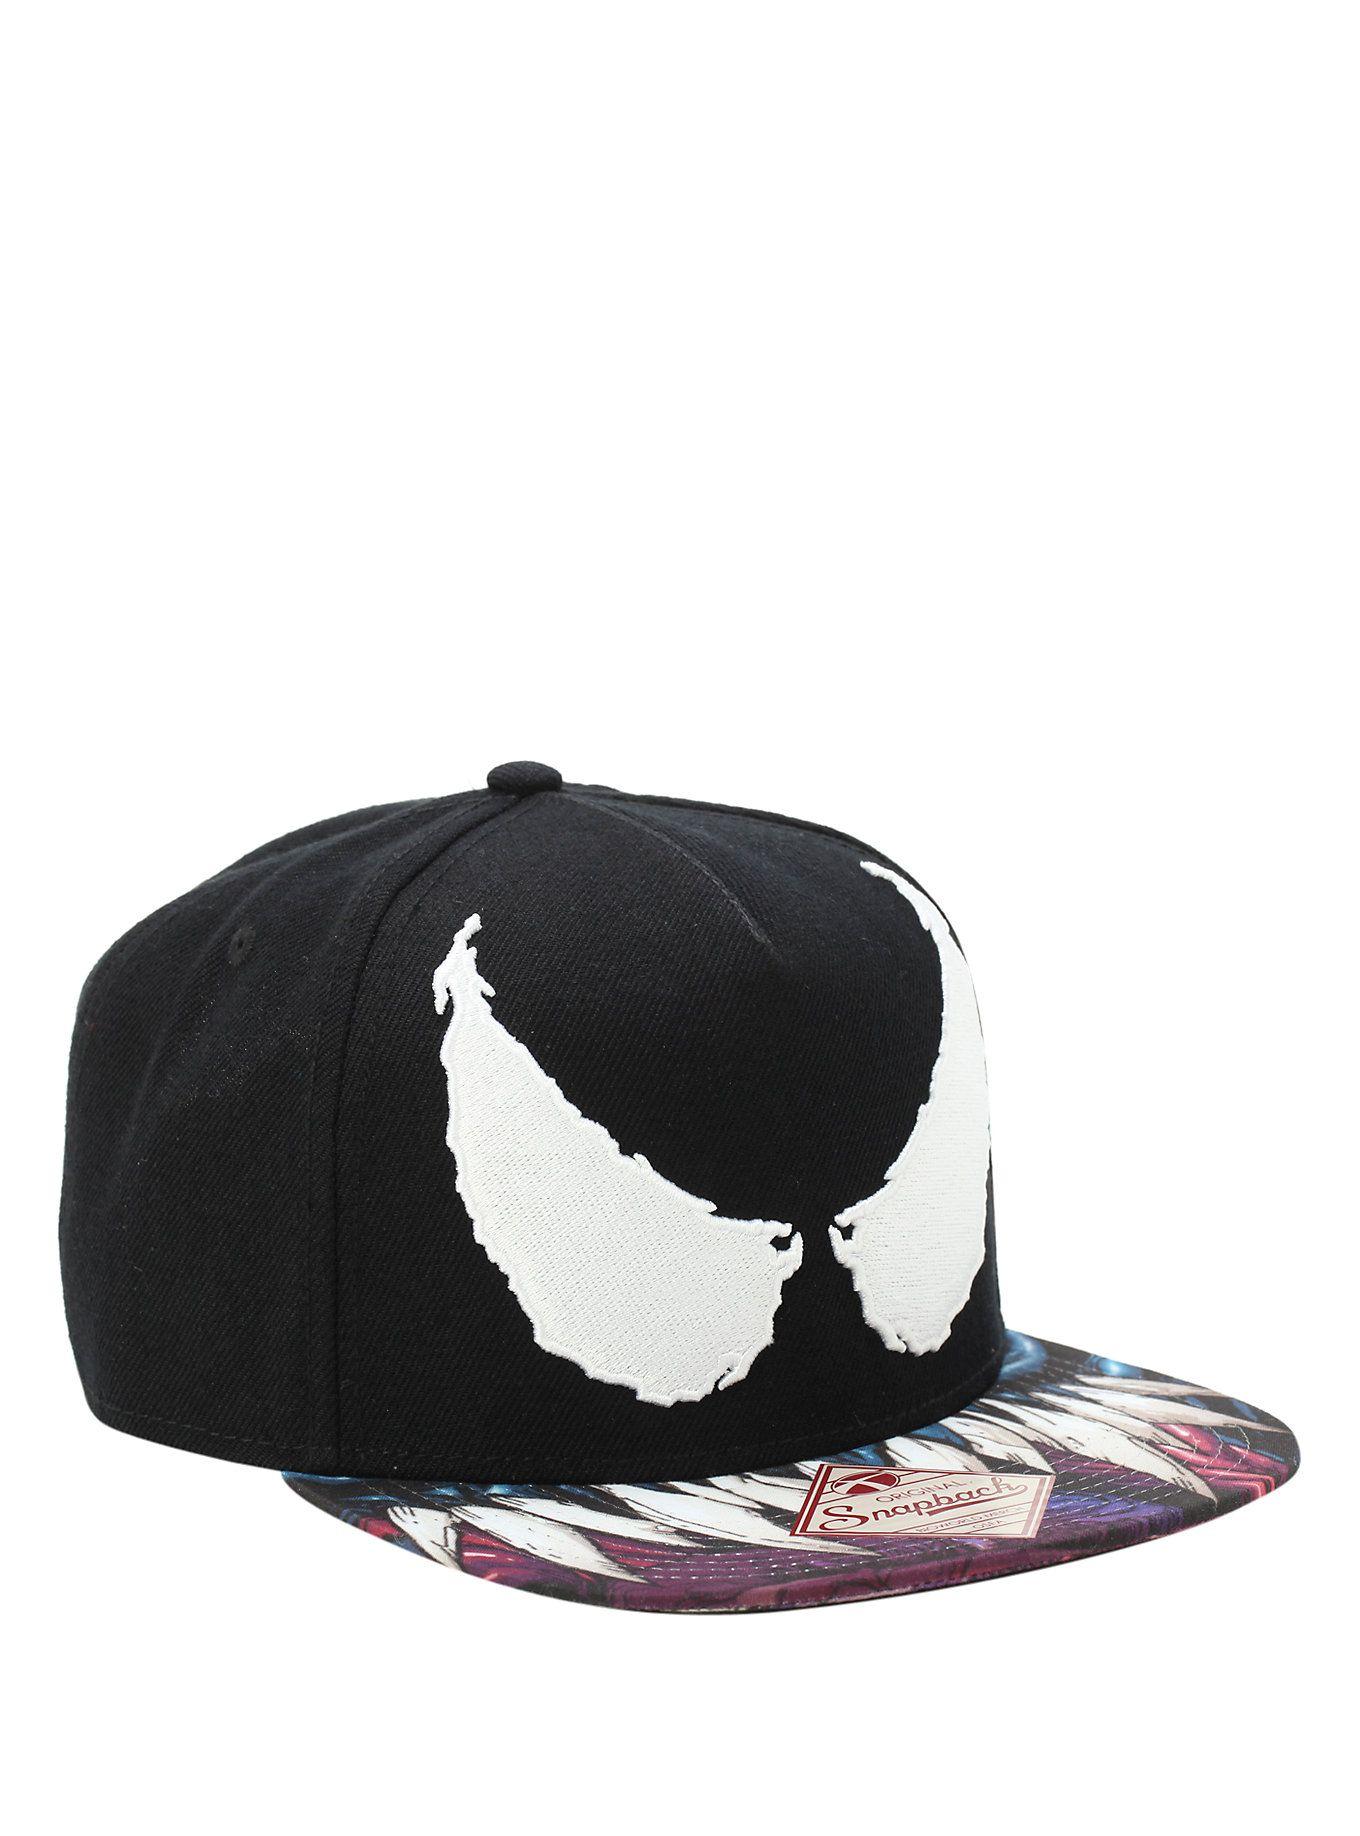 Hats Cool Hats For Men Women Accessories Cool Hats Hats For Men Snapback Hats